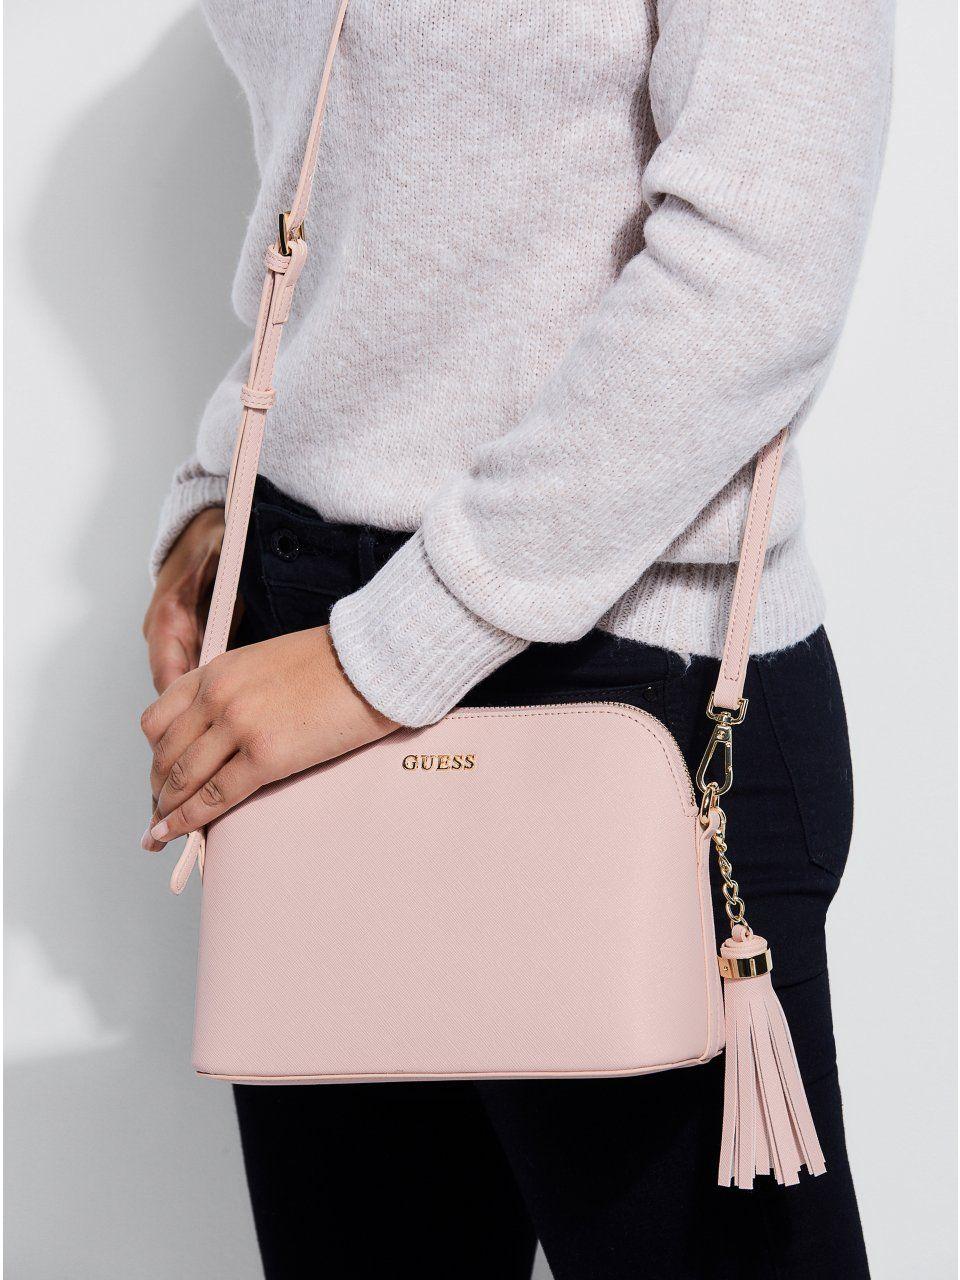 ec48a499c7f4 Scarlet Crossbody in 2019 | Products | Purses, bags, Handbag ...